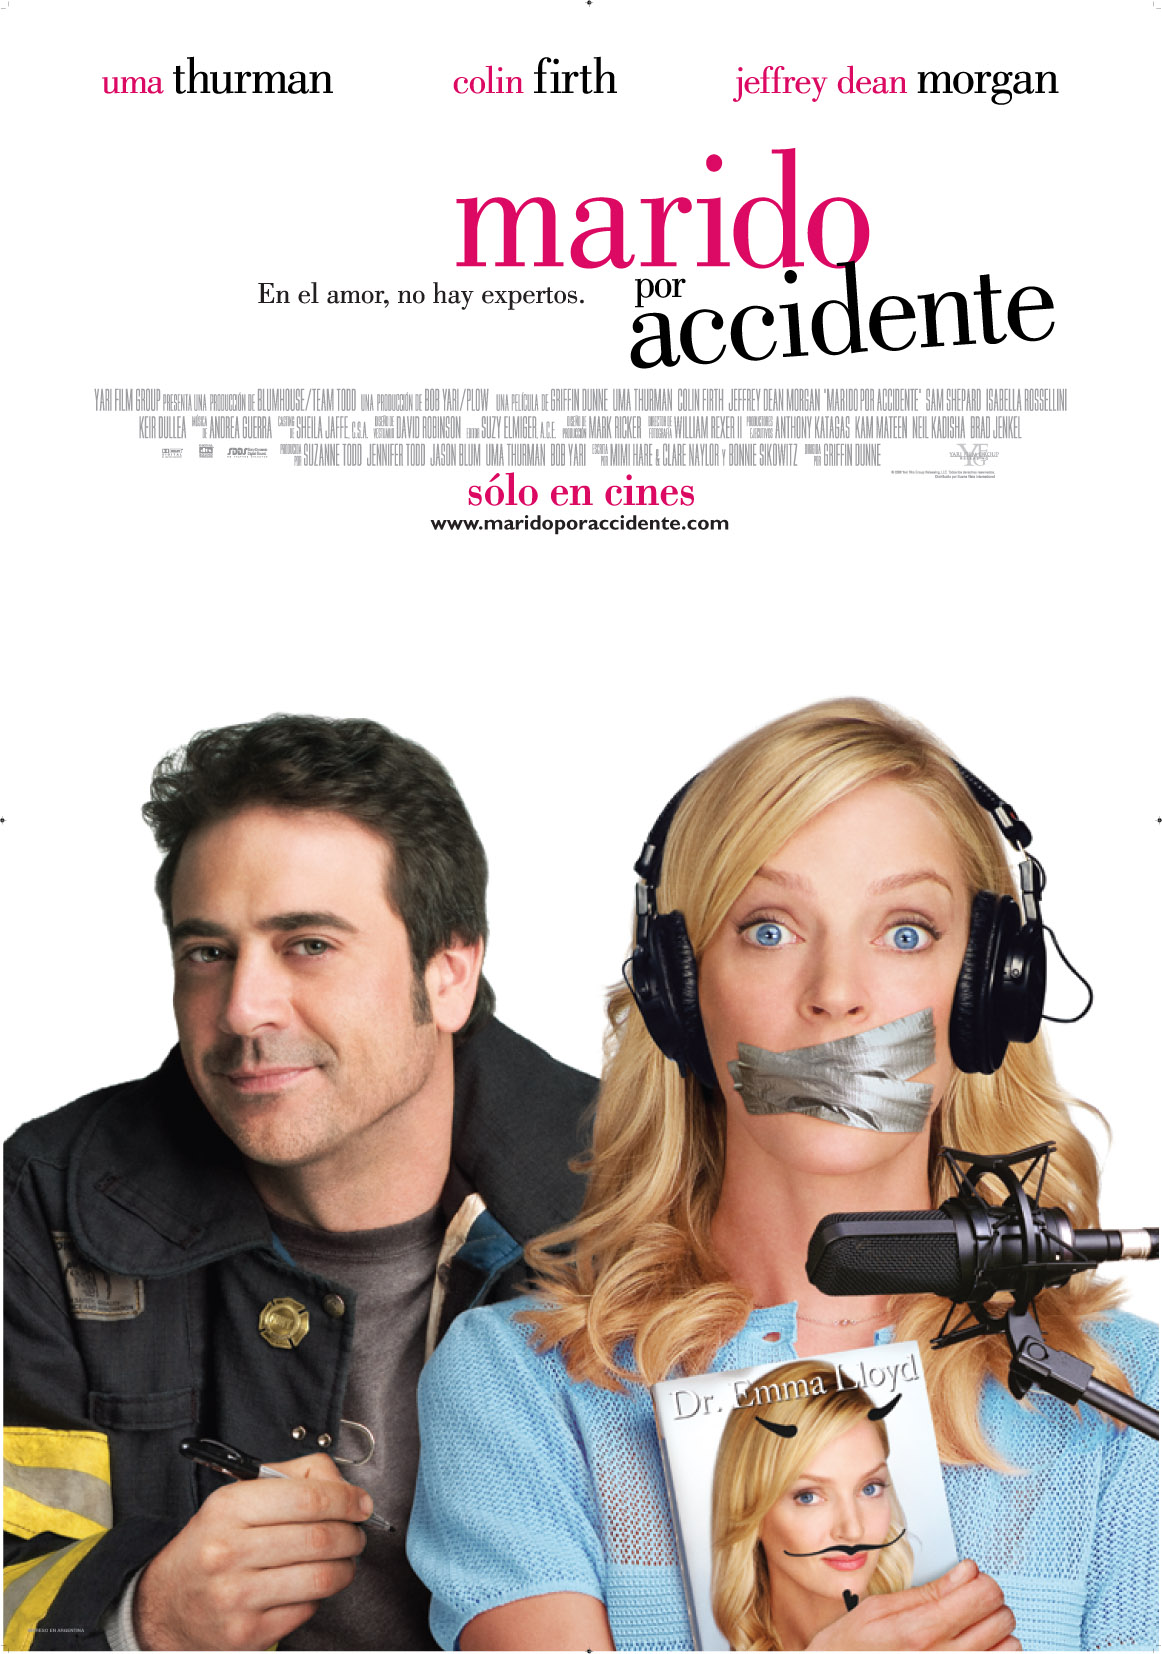 Matrimonio Por Accidente Pelicula : Marido por accidente doblaje wiki fandom powered by wikia